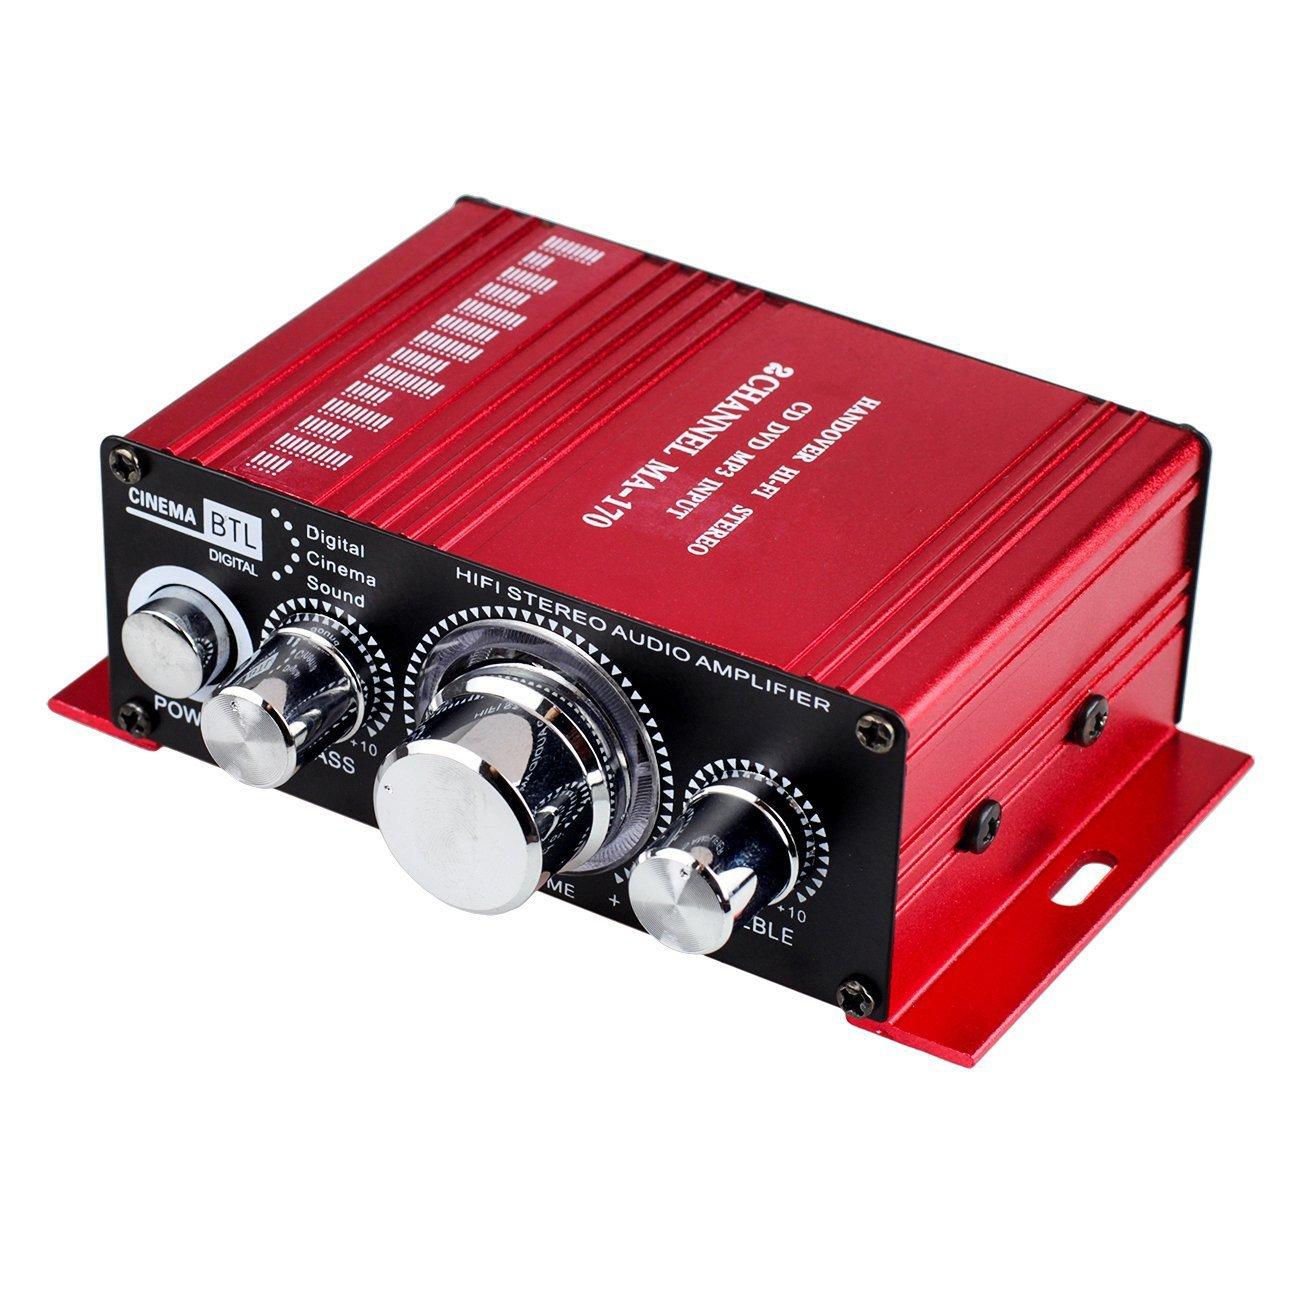 Car Audio Amplifier 20W + 20W Dual Channel Digital Mini HiFi Stereo Power Amplifier Handover AMP 12V for CD DVD MP3 PC Home Car